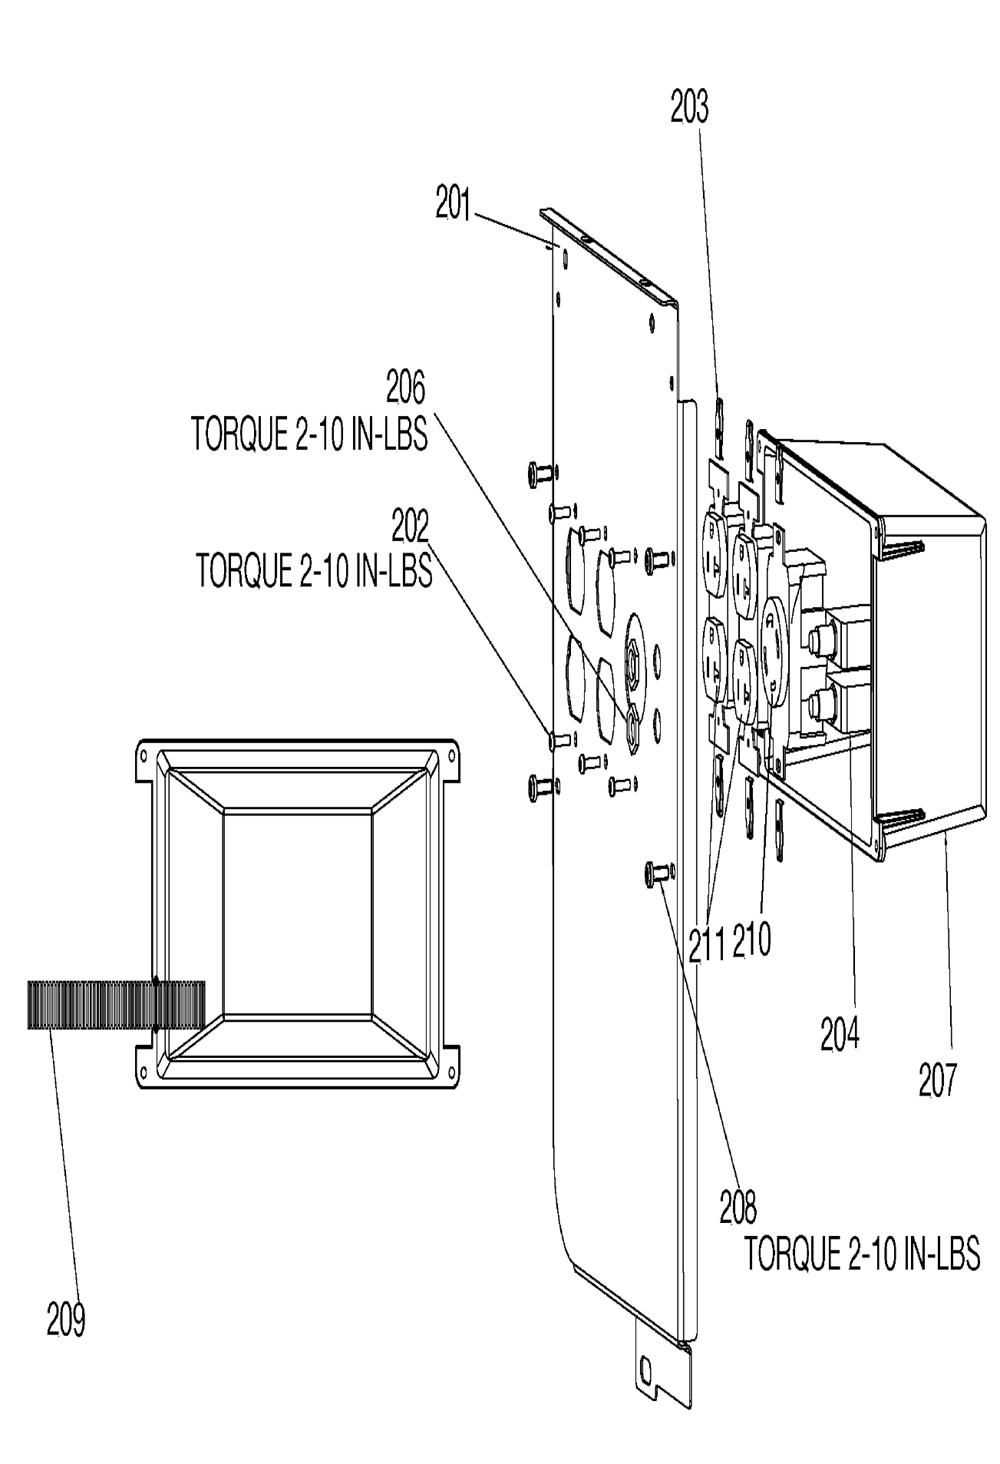 BSI550-W-portercable-T1-PB-1Break Down